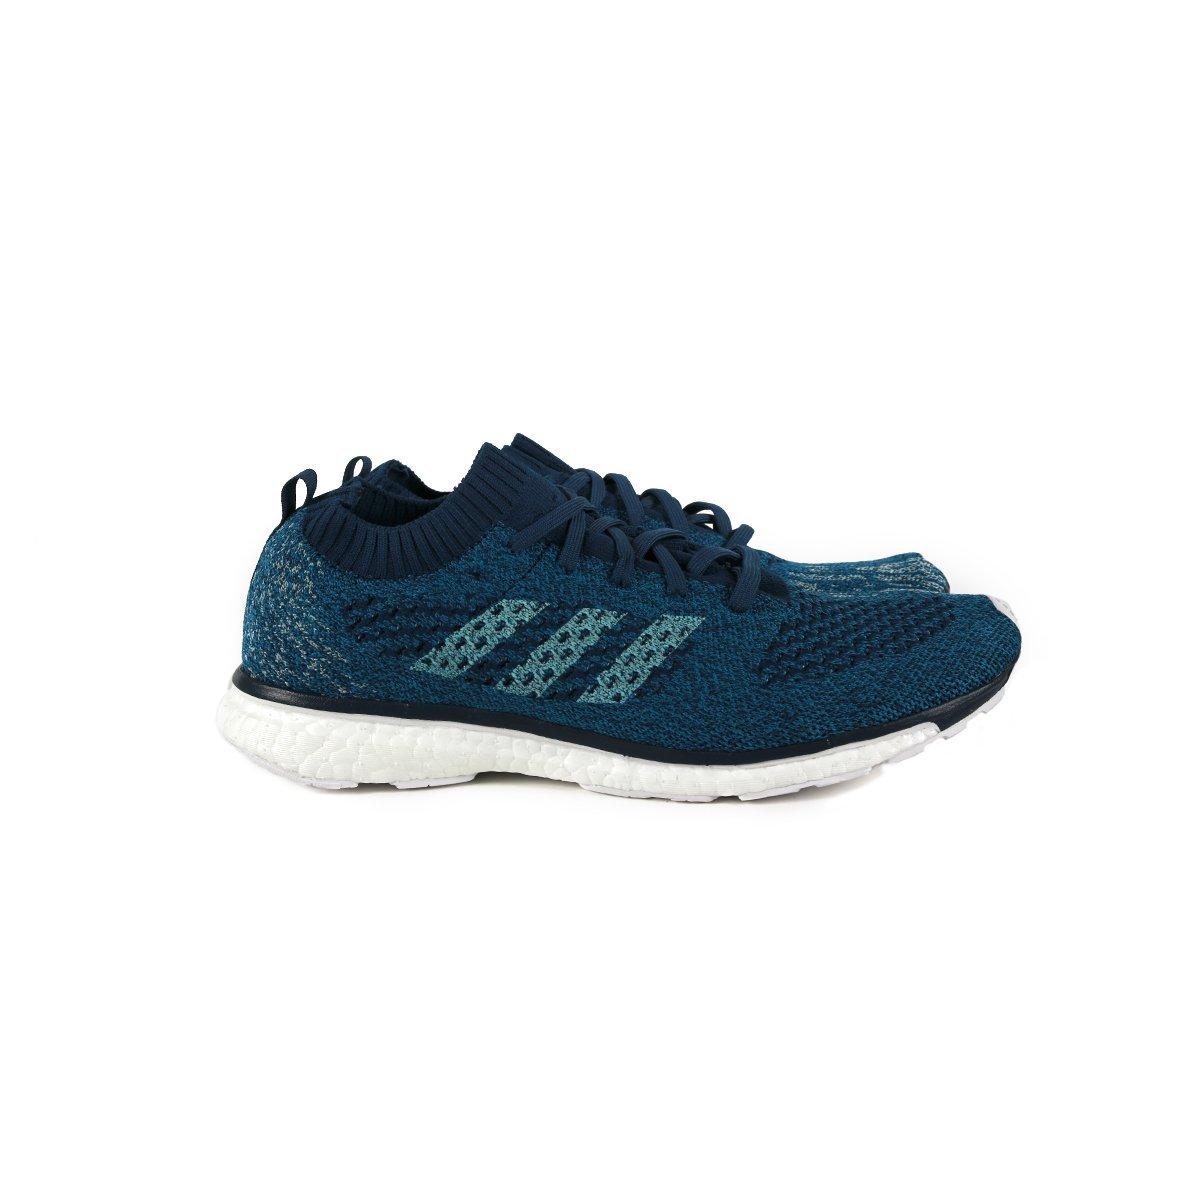 adidas Adizero Prime Parley Shoe Unisex Running B0751KTSC8 8 D(M) US|Blue